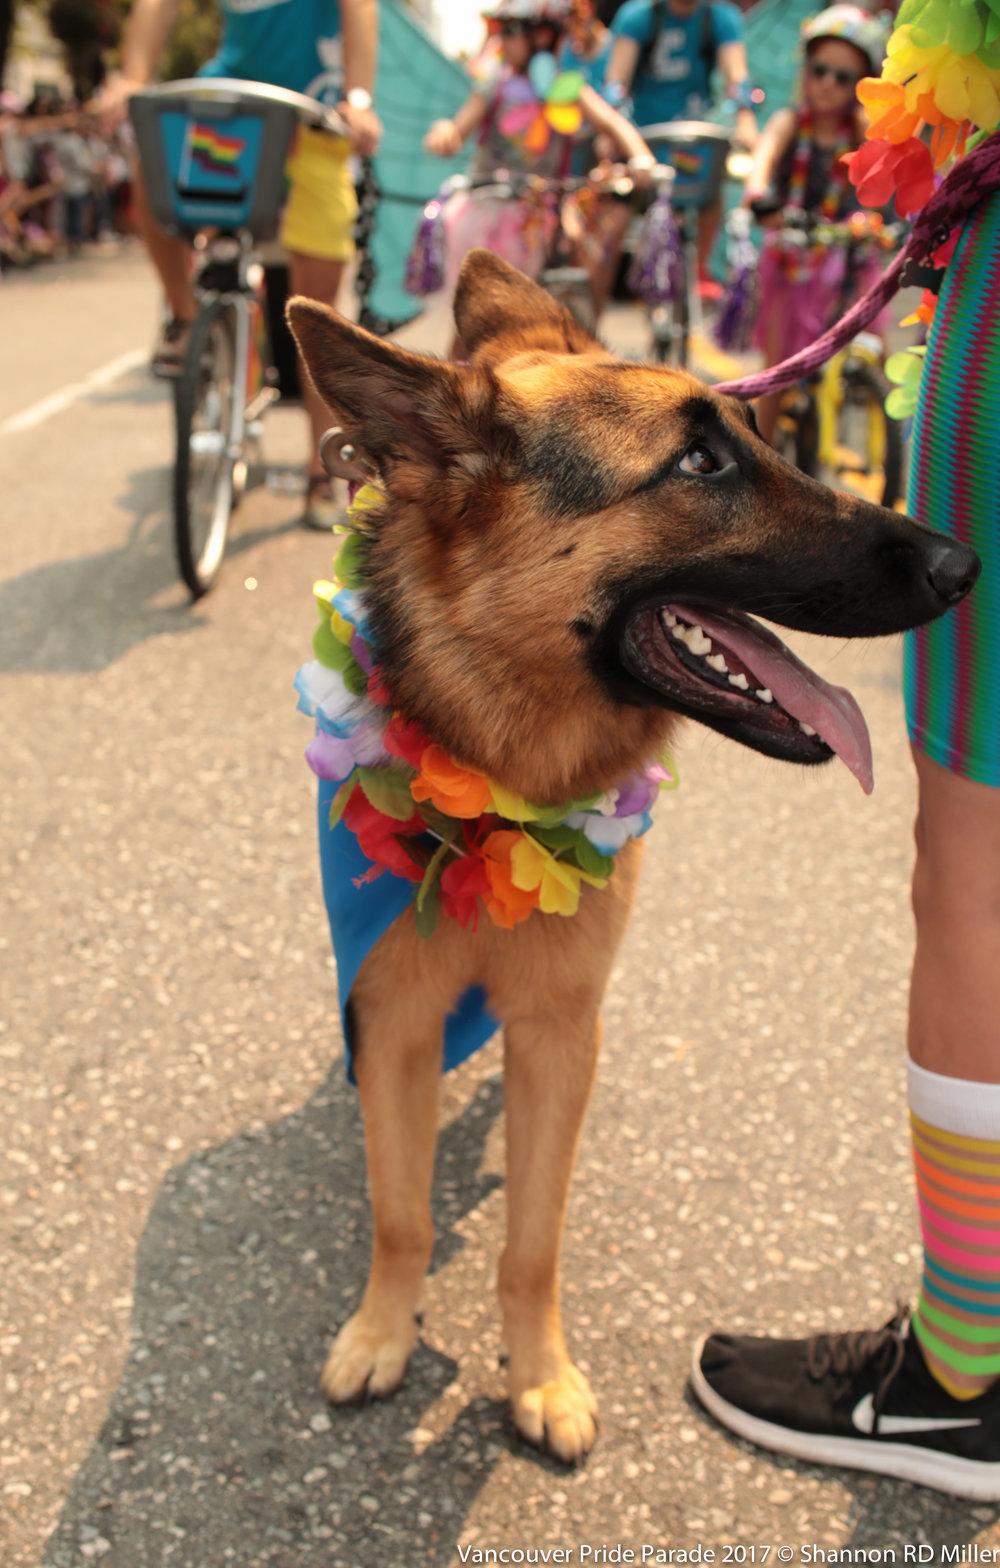 www.shannonruthdionne.com_Pride_Parade_20170806-3286.jpg